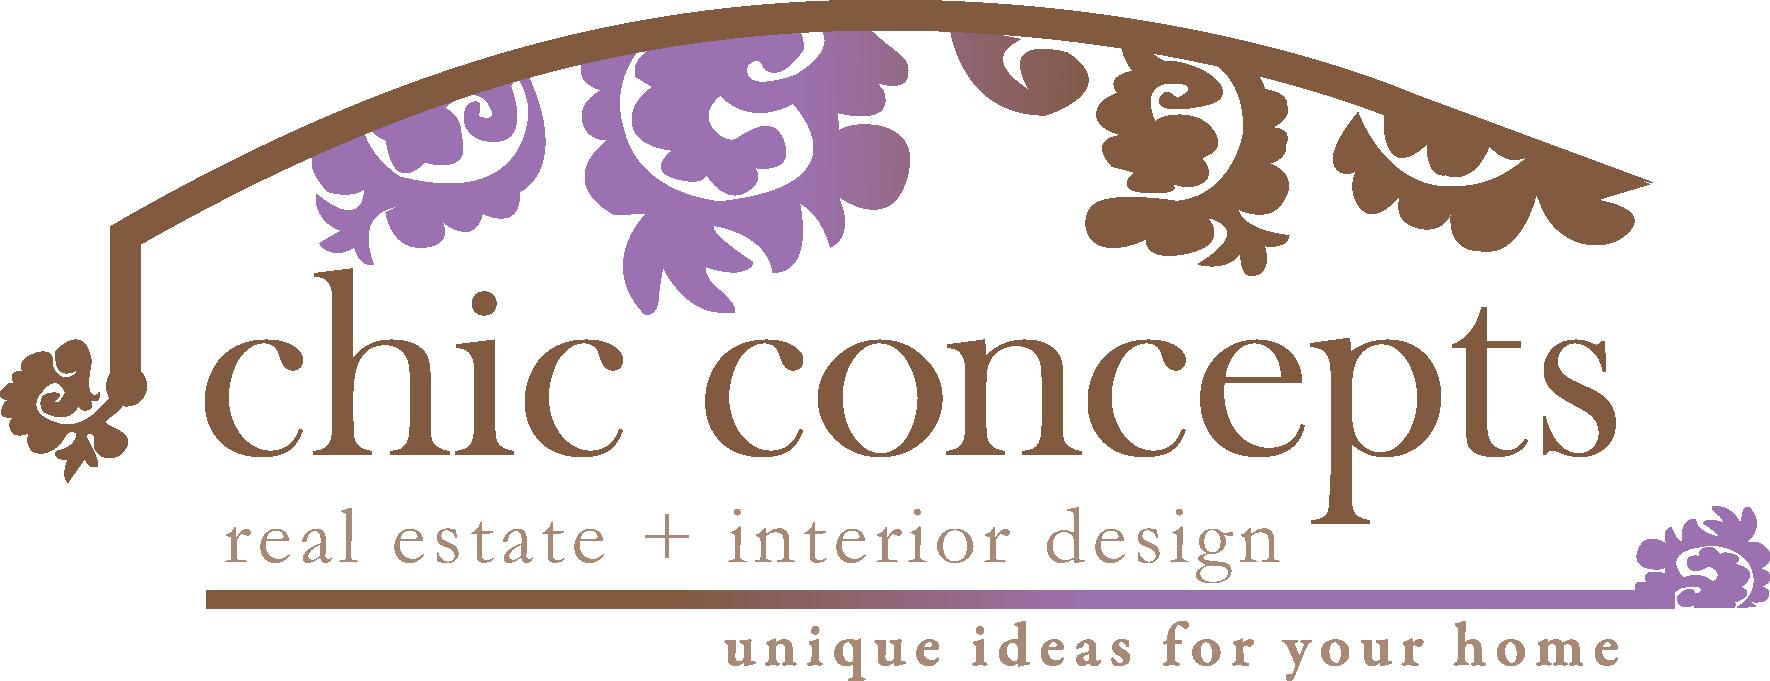 real estate logo design realtor logo design graphic design for realtors